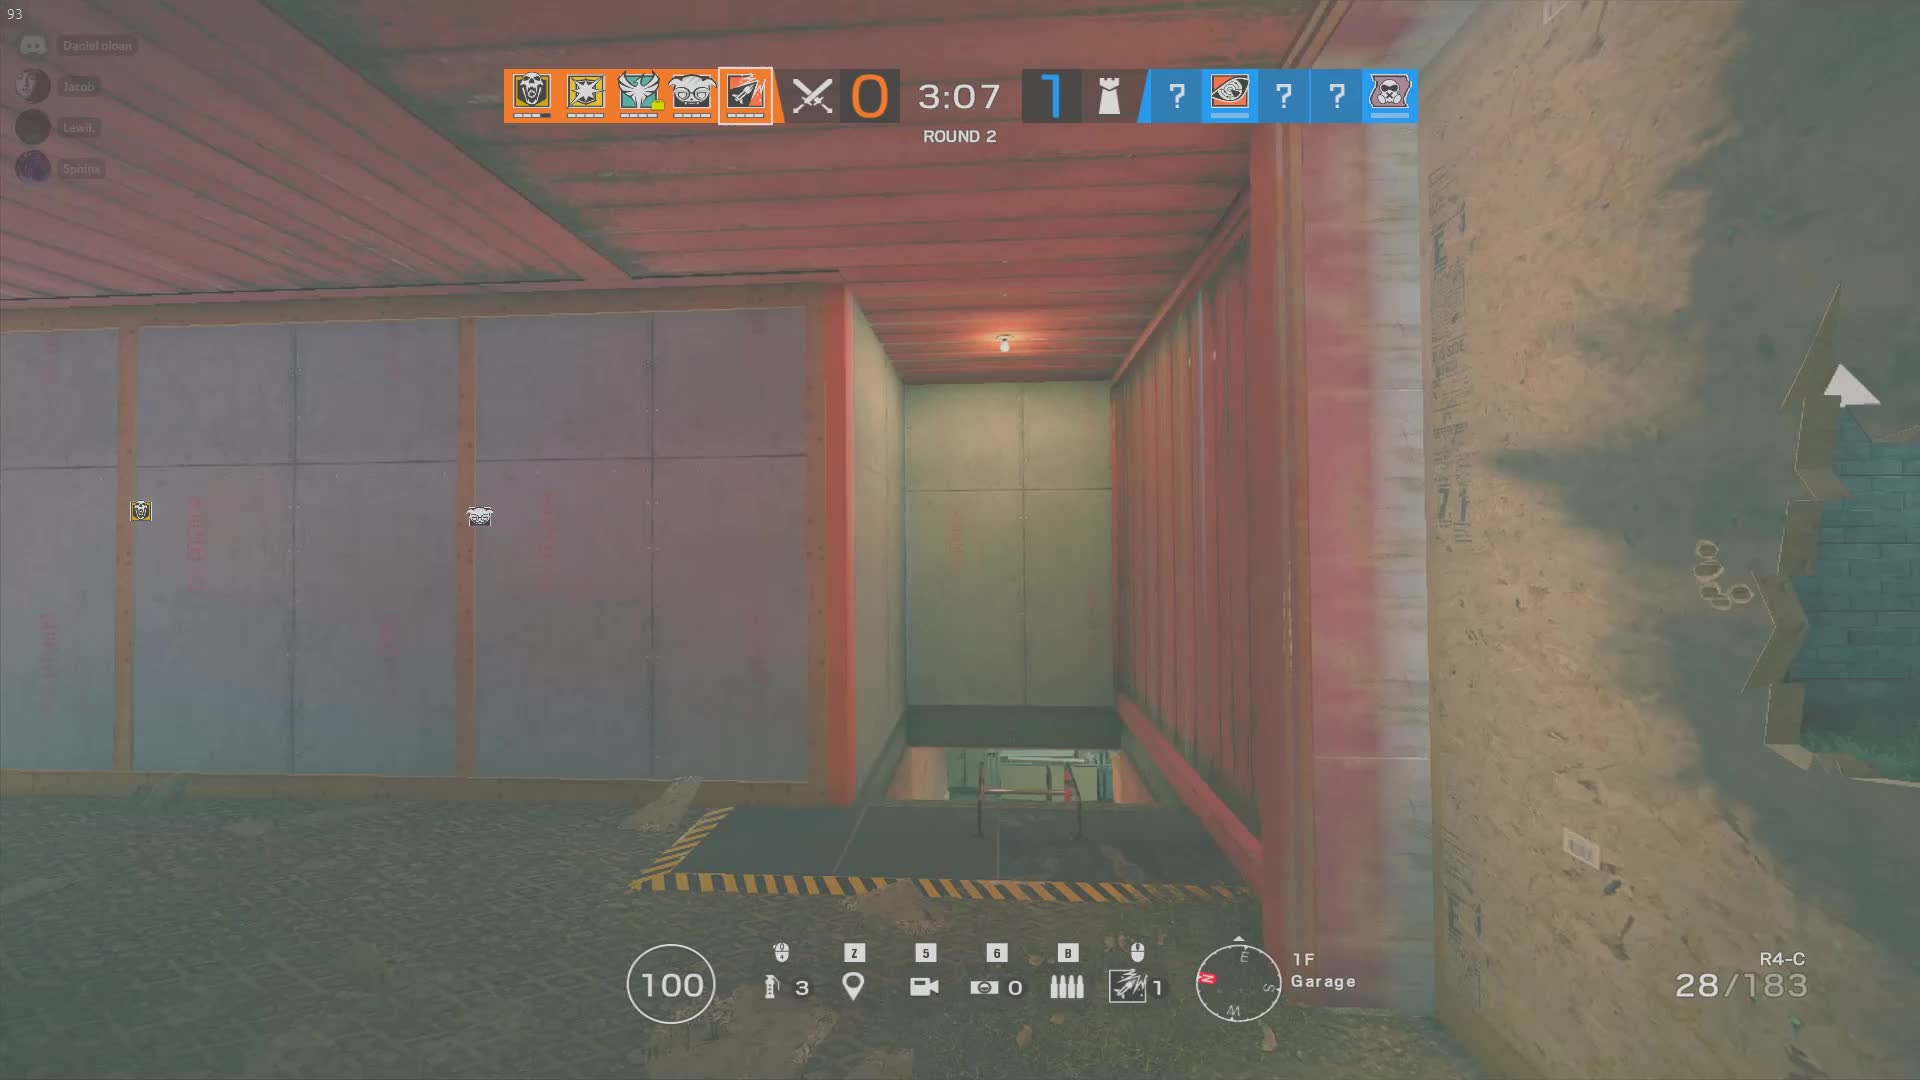 Rainbow6, Siege, Hacks GIFs